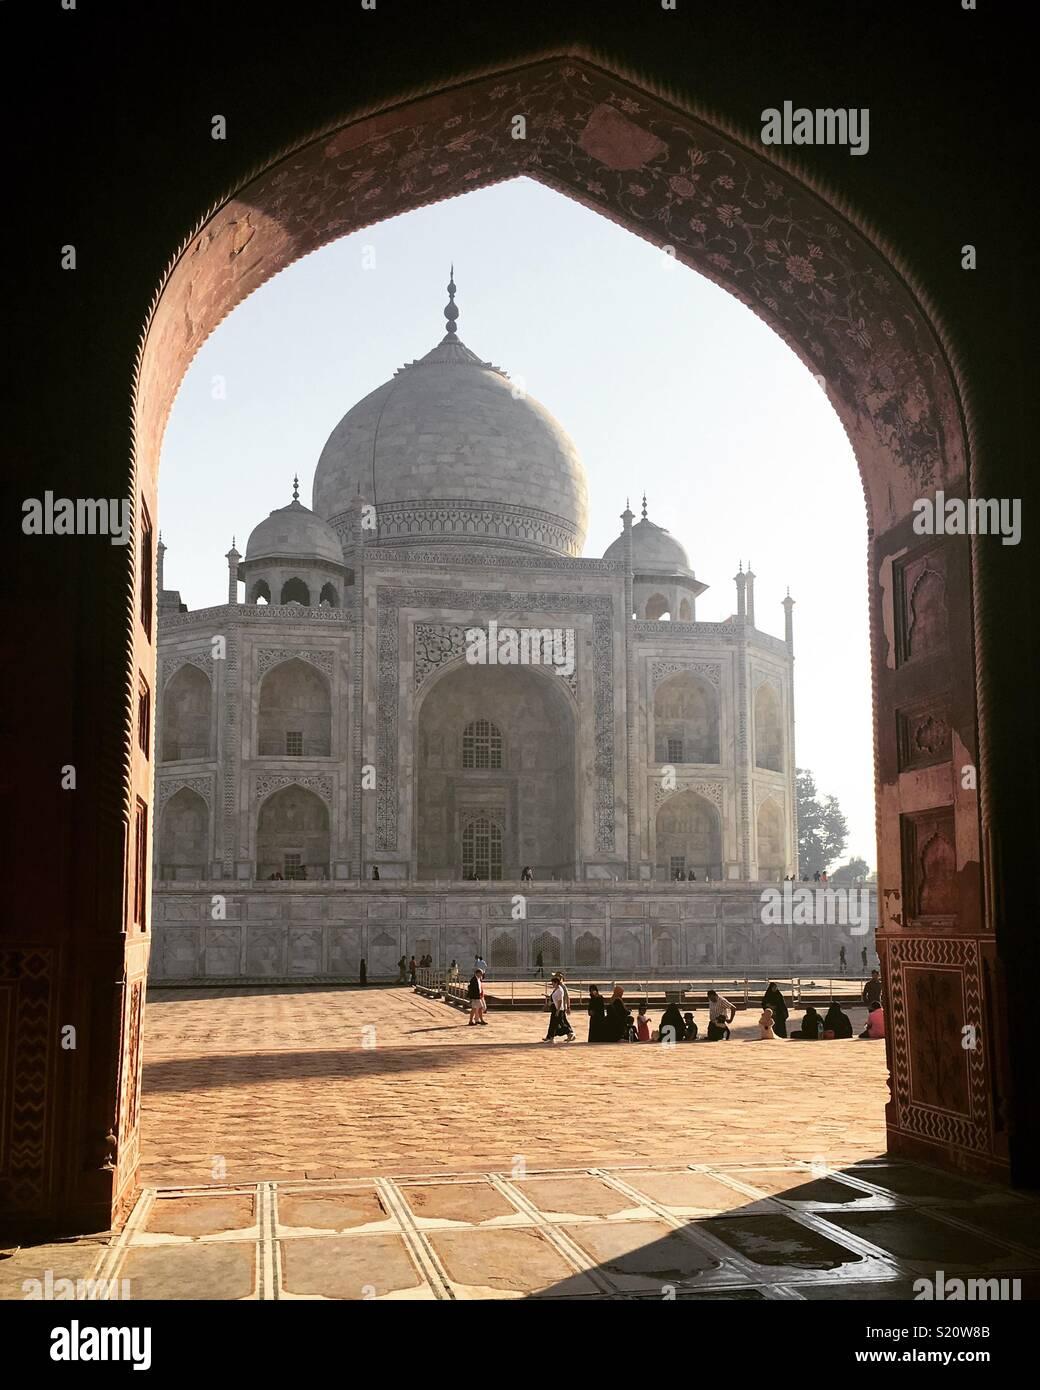 Taj Mahal - Agra, India Imagen De Stock